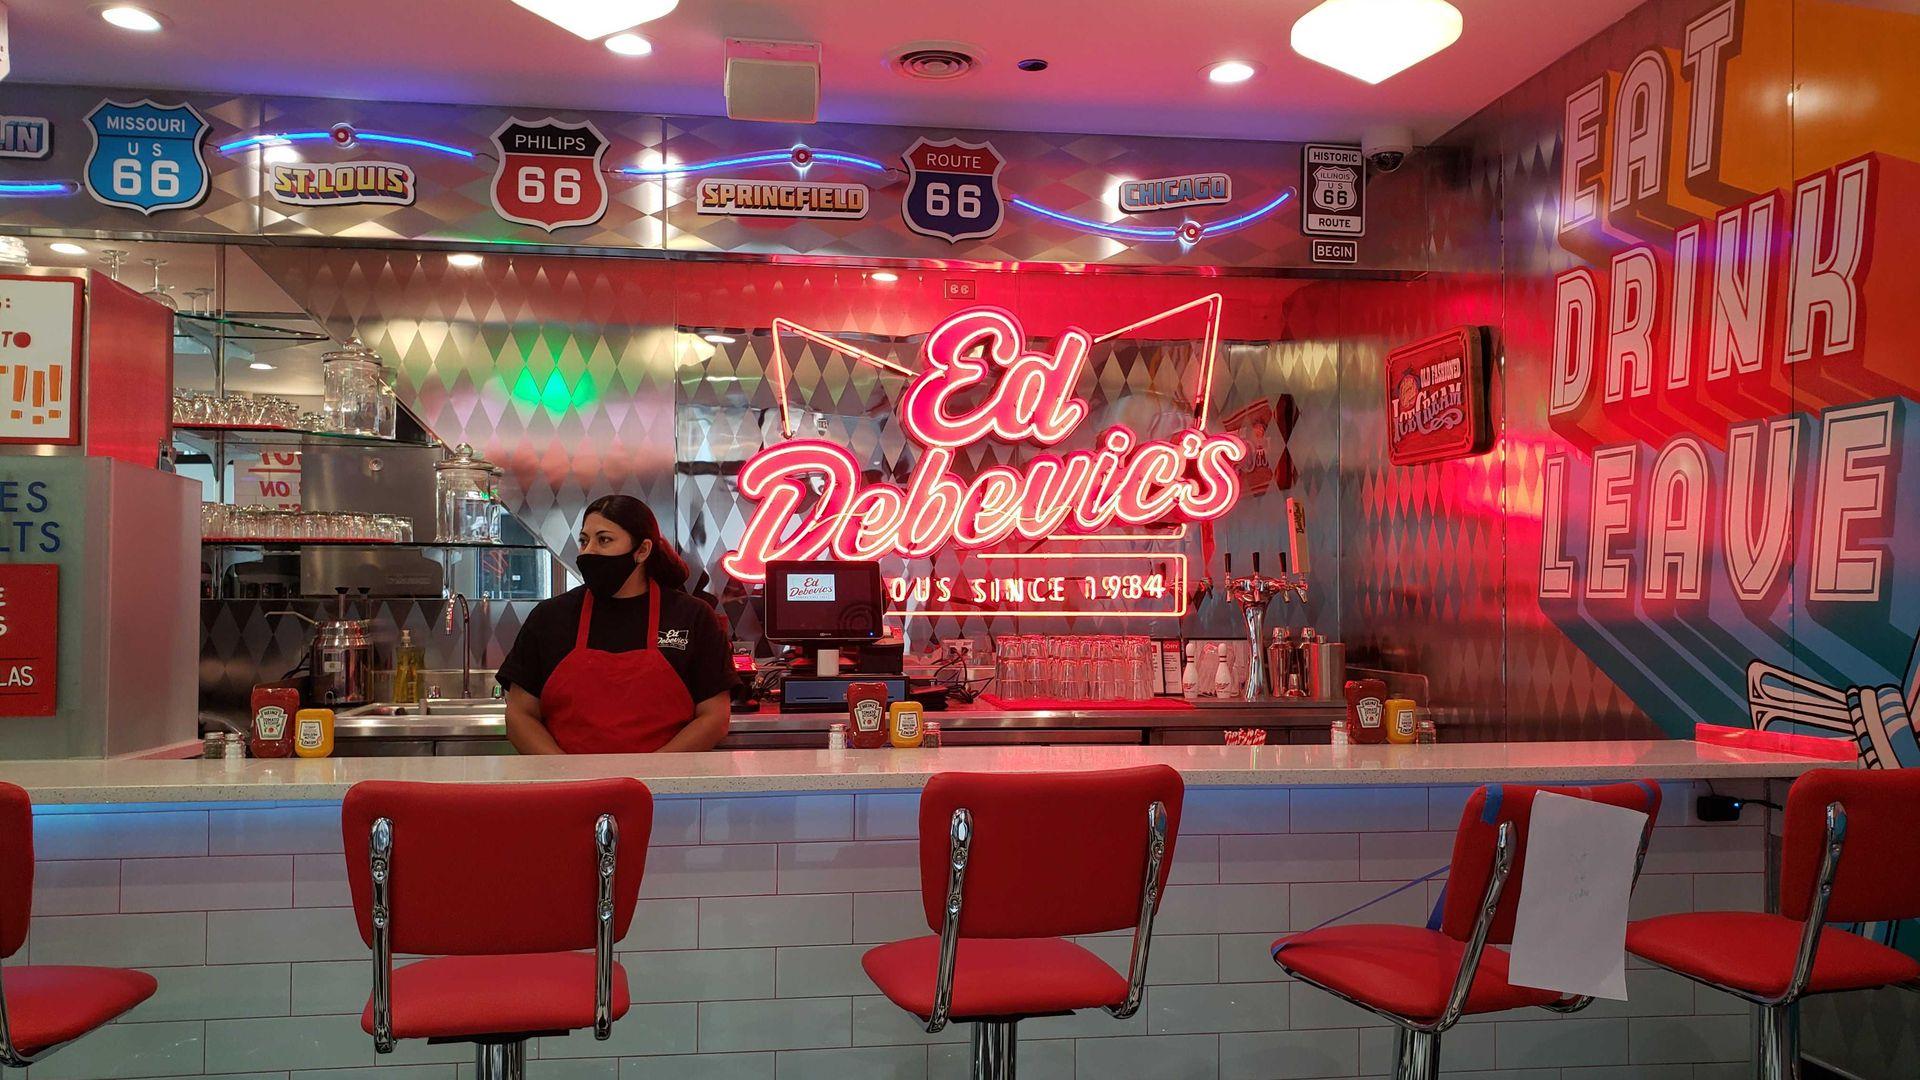 The counter at Ed Debevics restaurant.